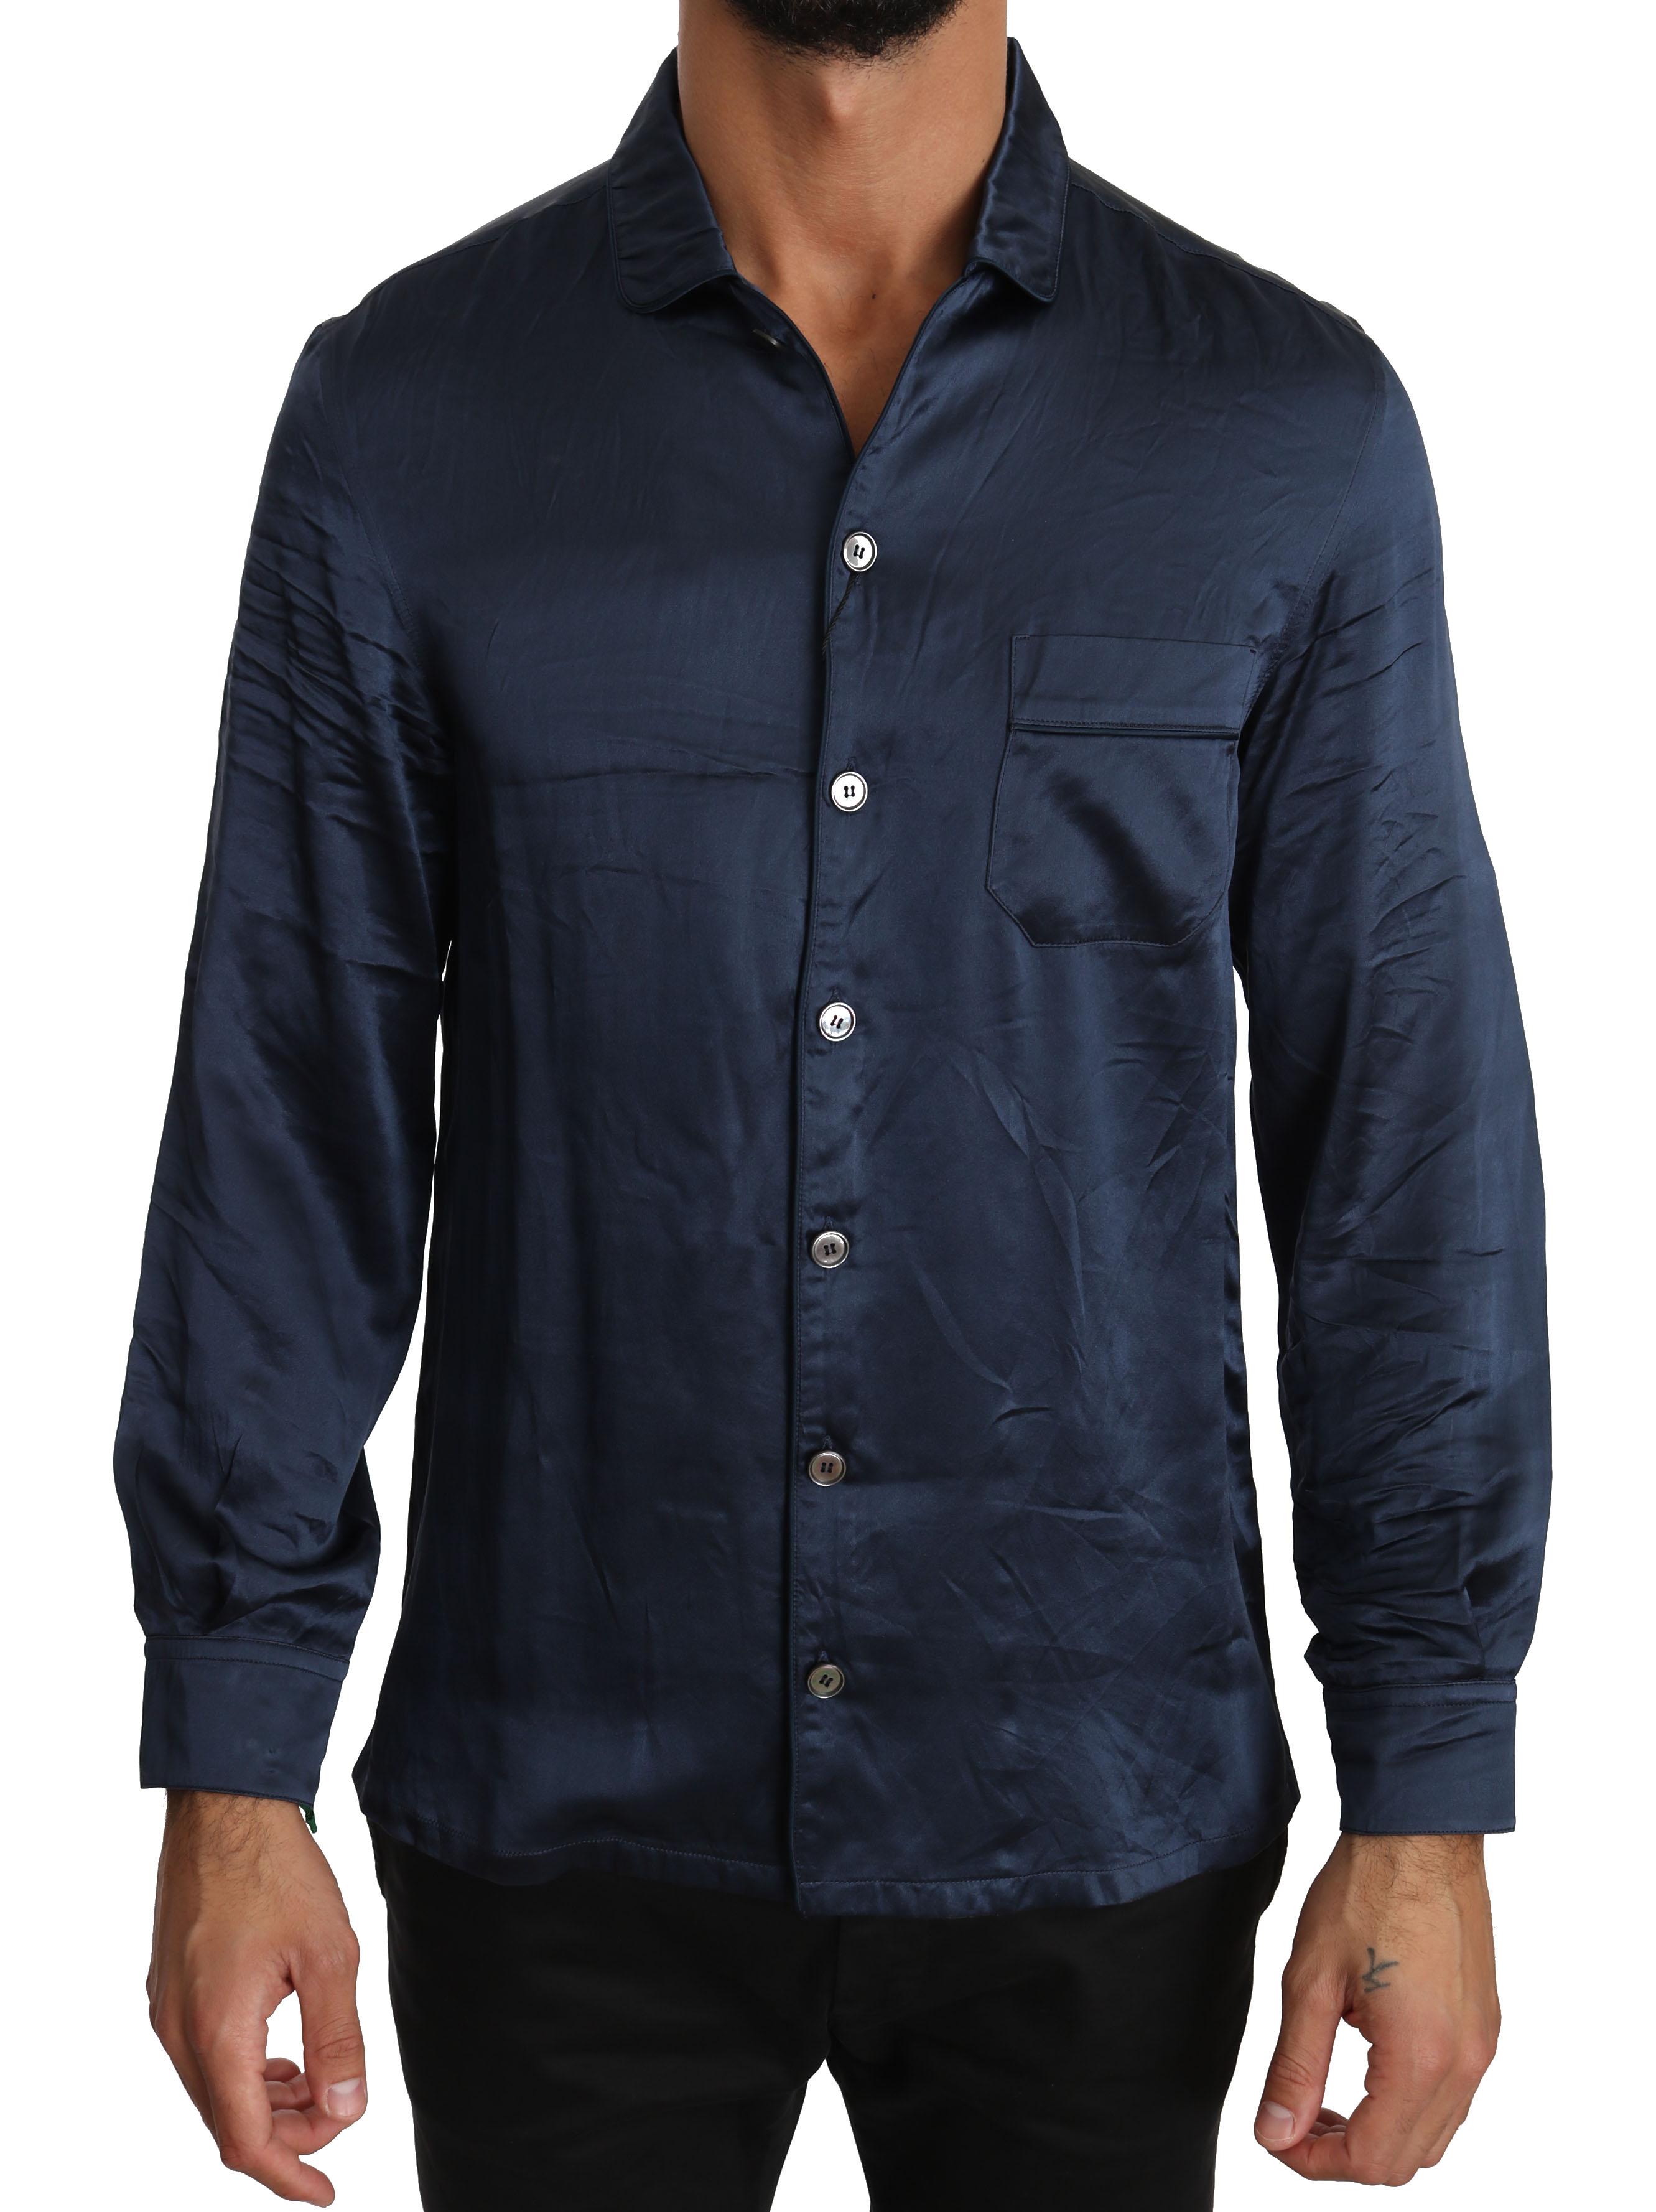 Dolce & Gabbana Men's Silk Casual Lounge Shirt Blue TSH2850 - IT38 | XS